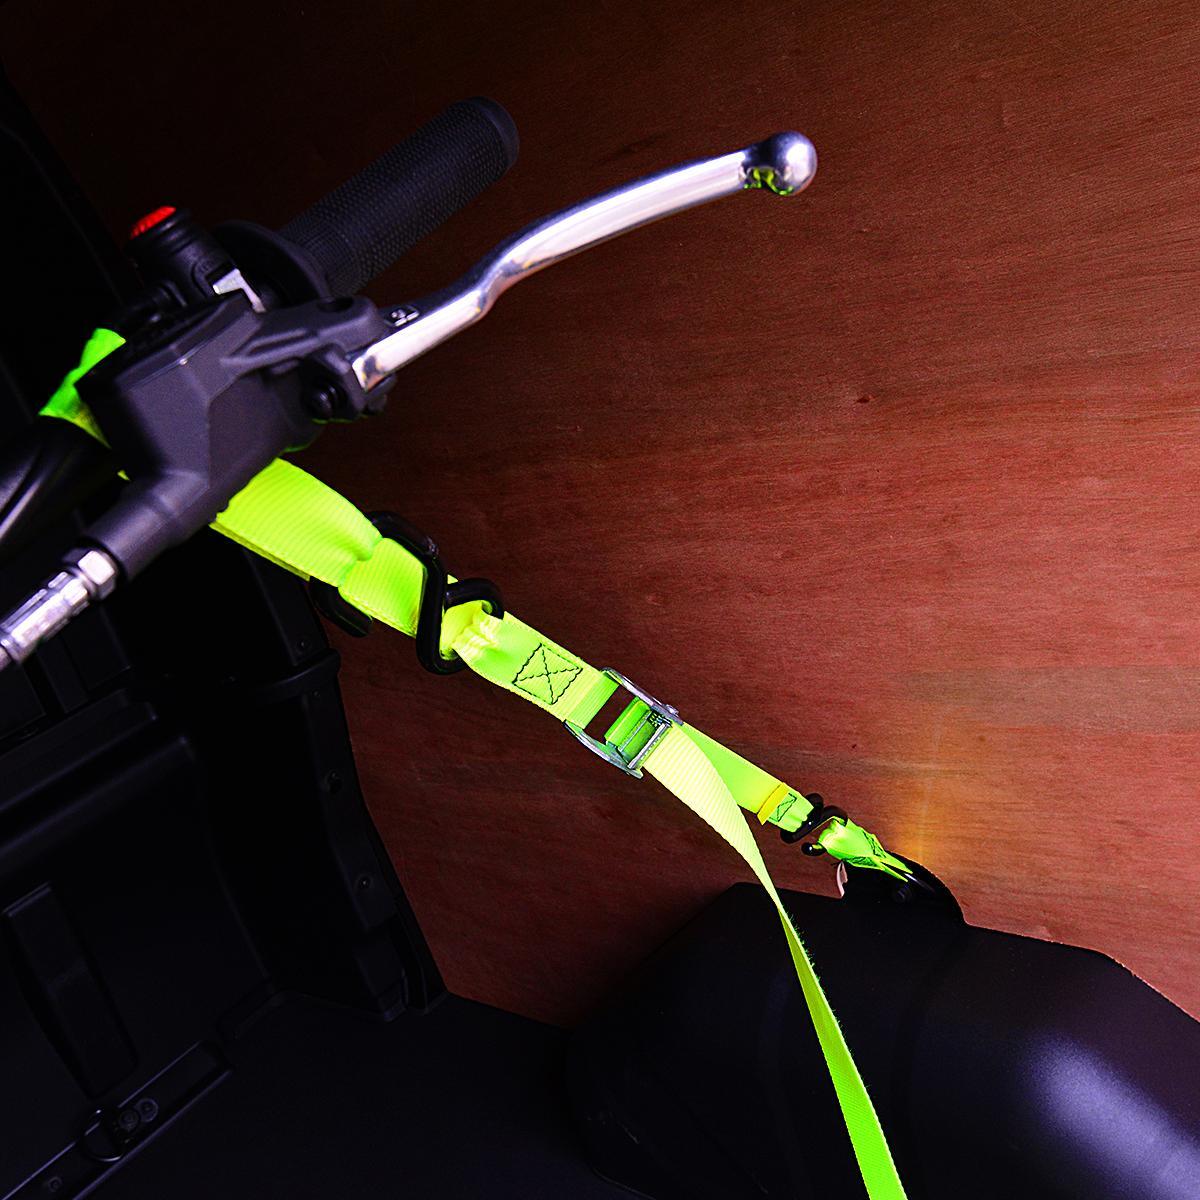 Hayabusa Motorcycle Engine Jet Ski: 2 X Tough Non Scratch Tie Down Straps For Motorcycles